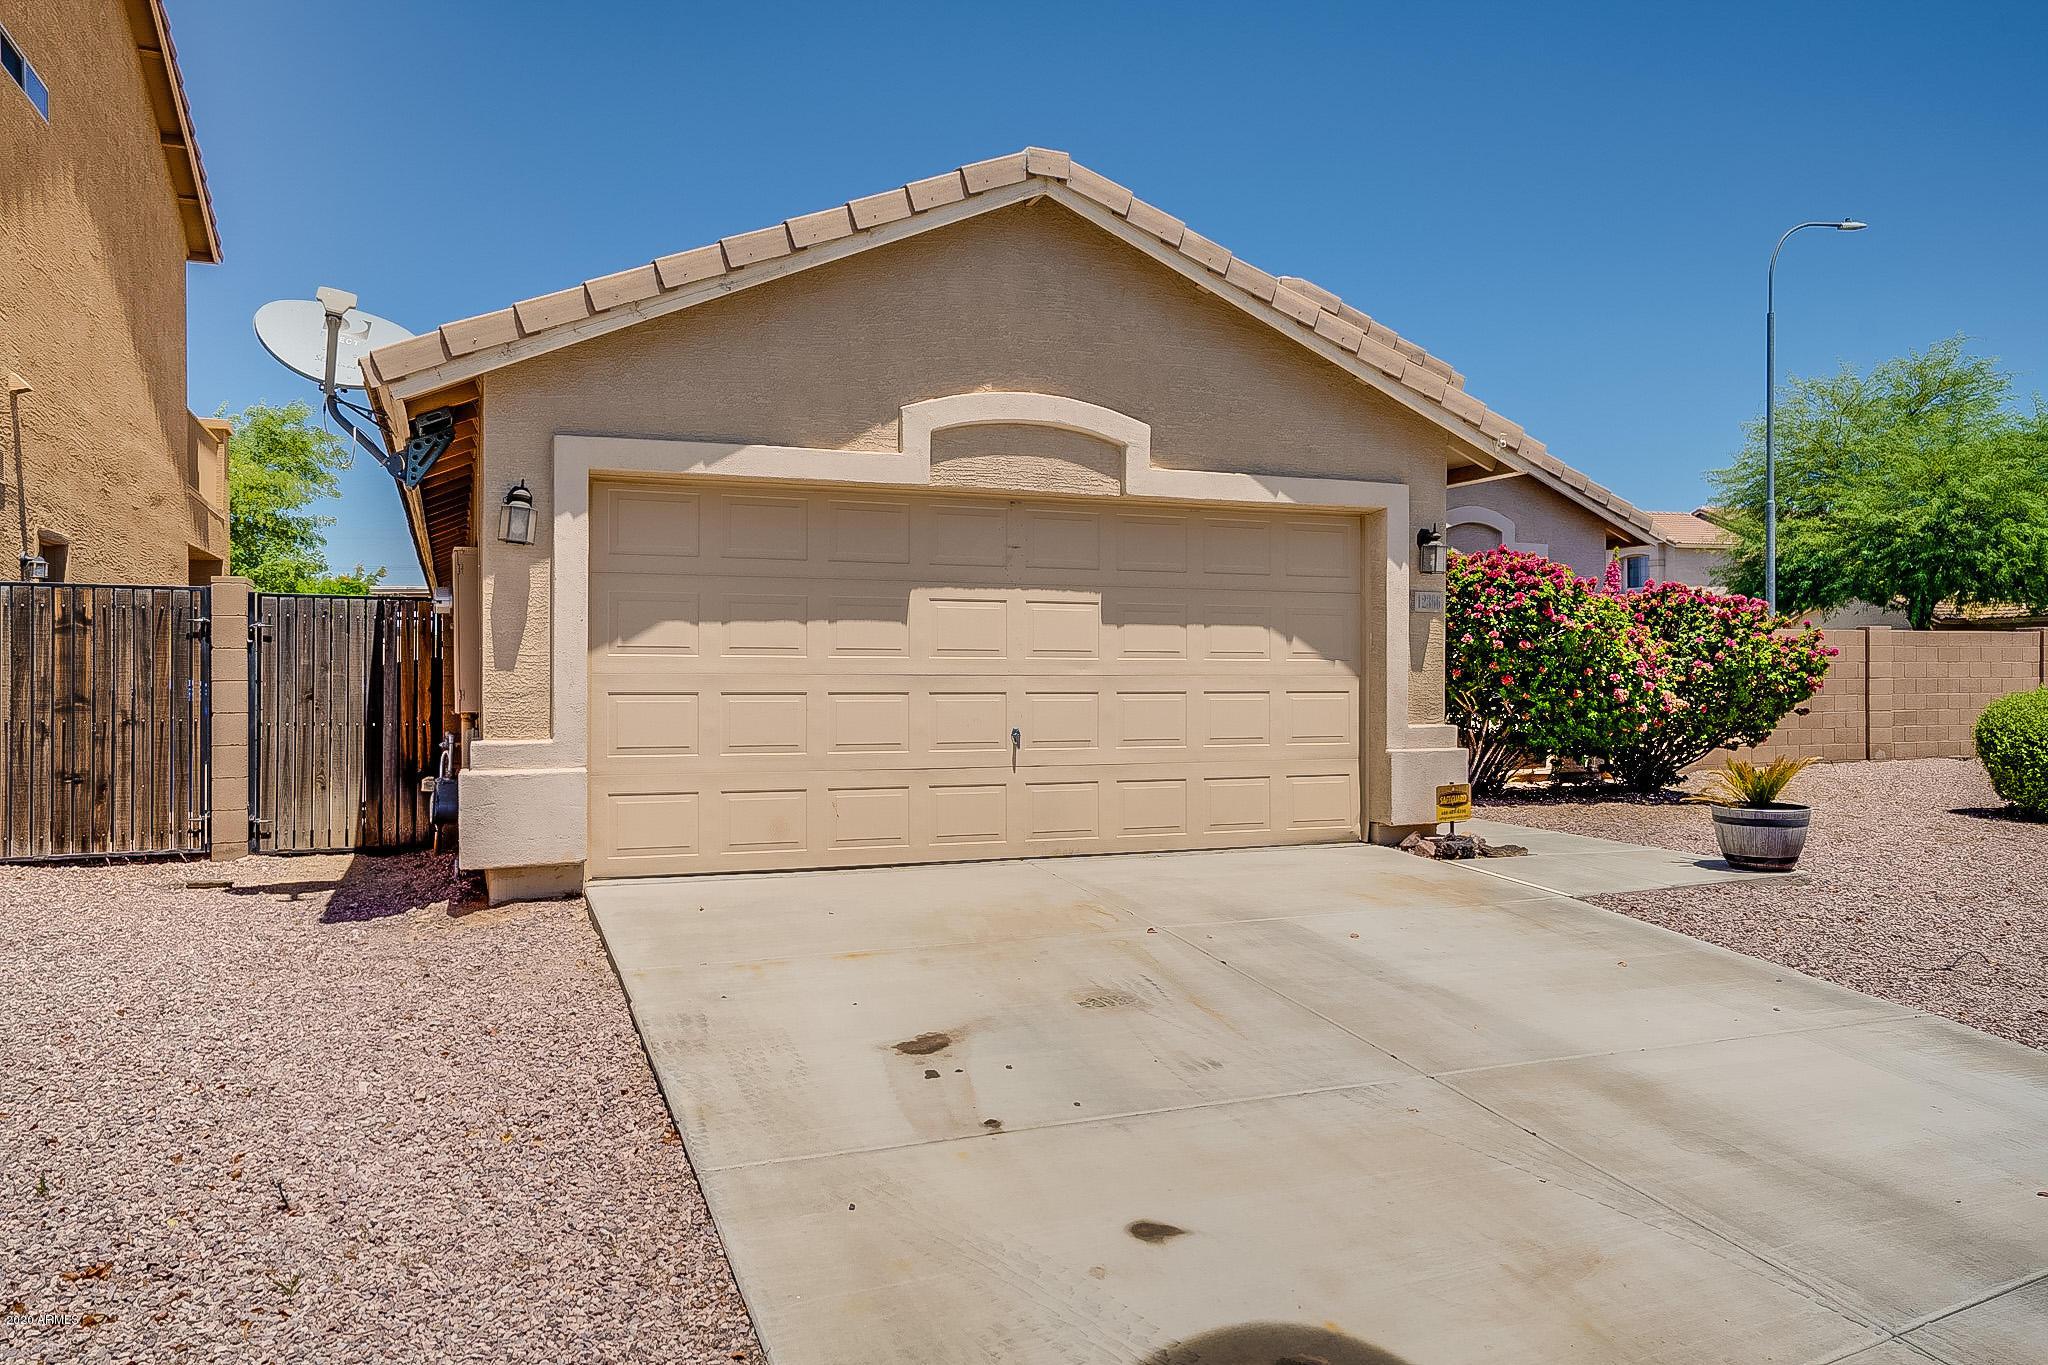 Photo of 12366 W FLANAGAN Street, Avondale, AZ 85323